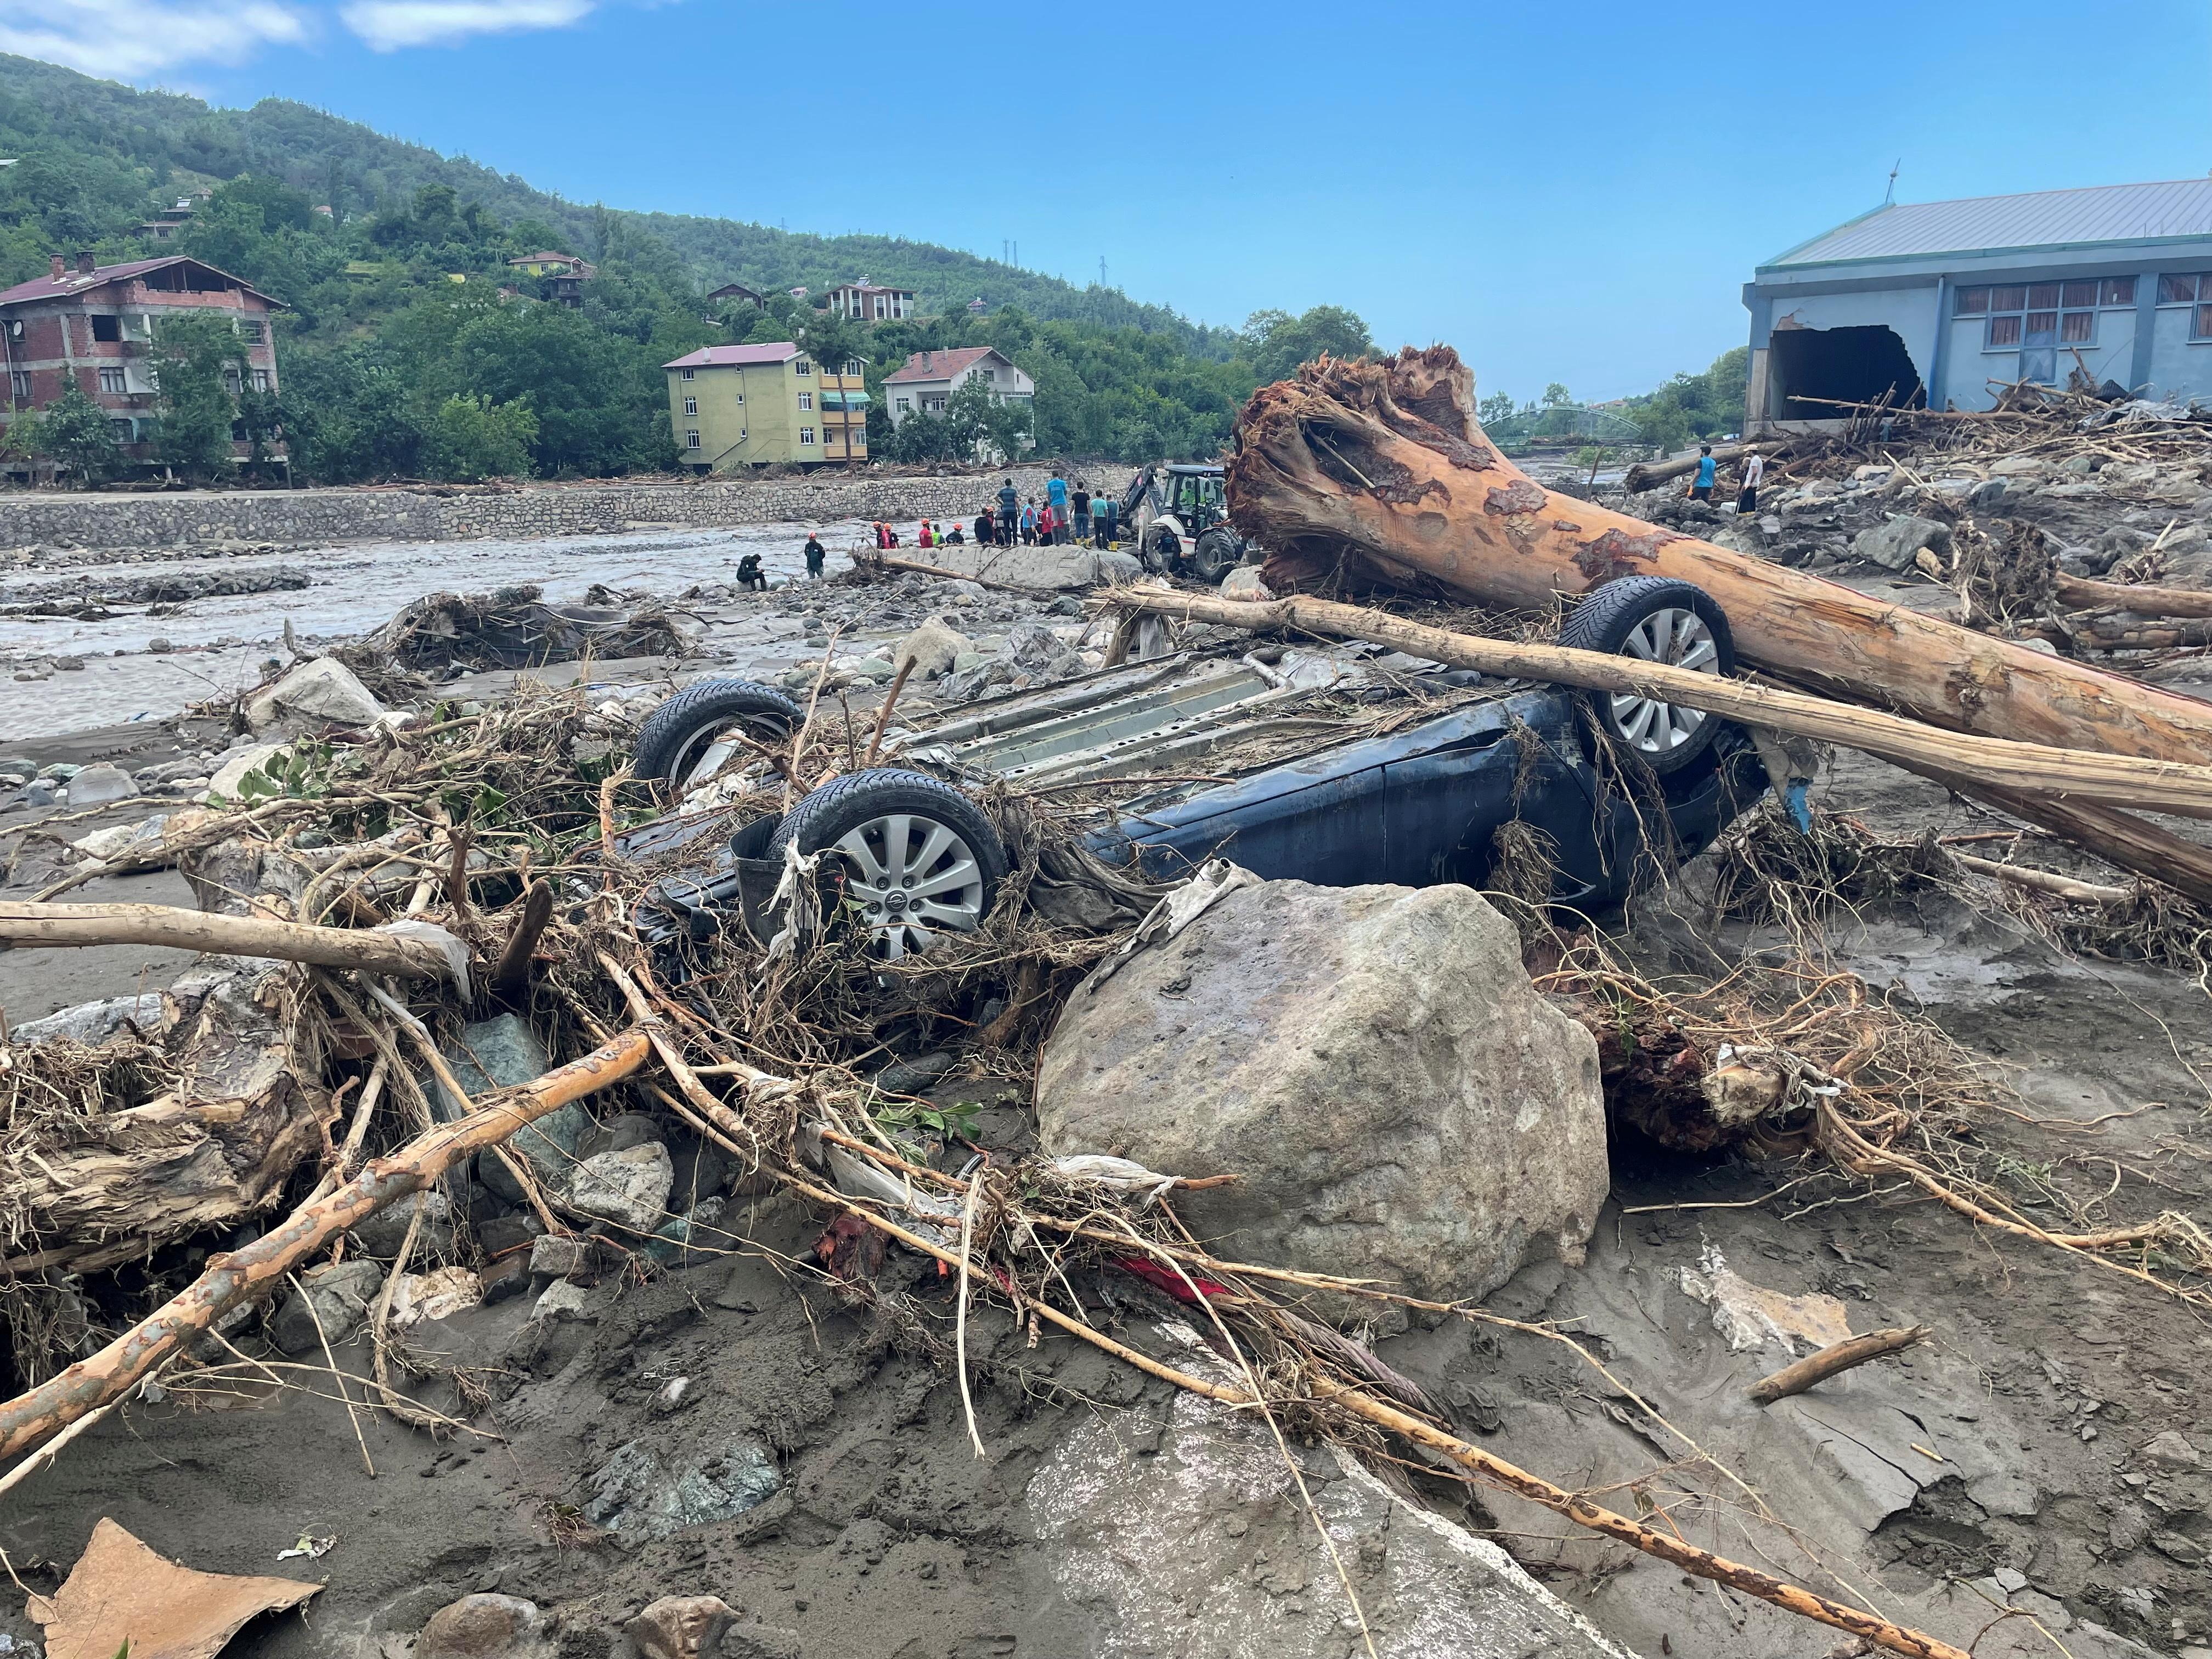 The wreckage of a vehicle is seen amid debris after flash floods swept through towns in the Turkish Black Sea region, in the town of Bozkurt, in Kastamonu province, Turkey, August 14, 2021. REUTERS/Mehmet Emin Caliskan